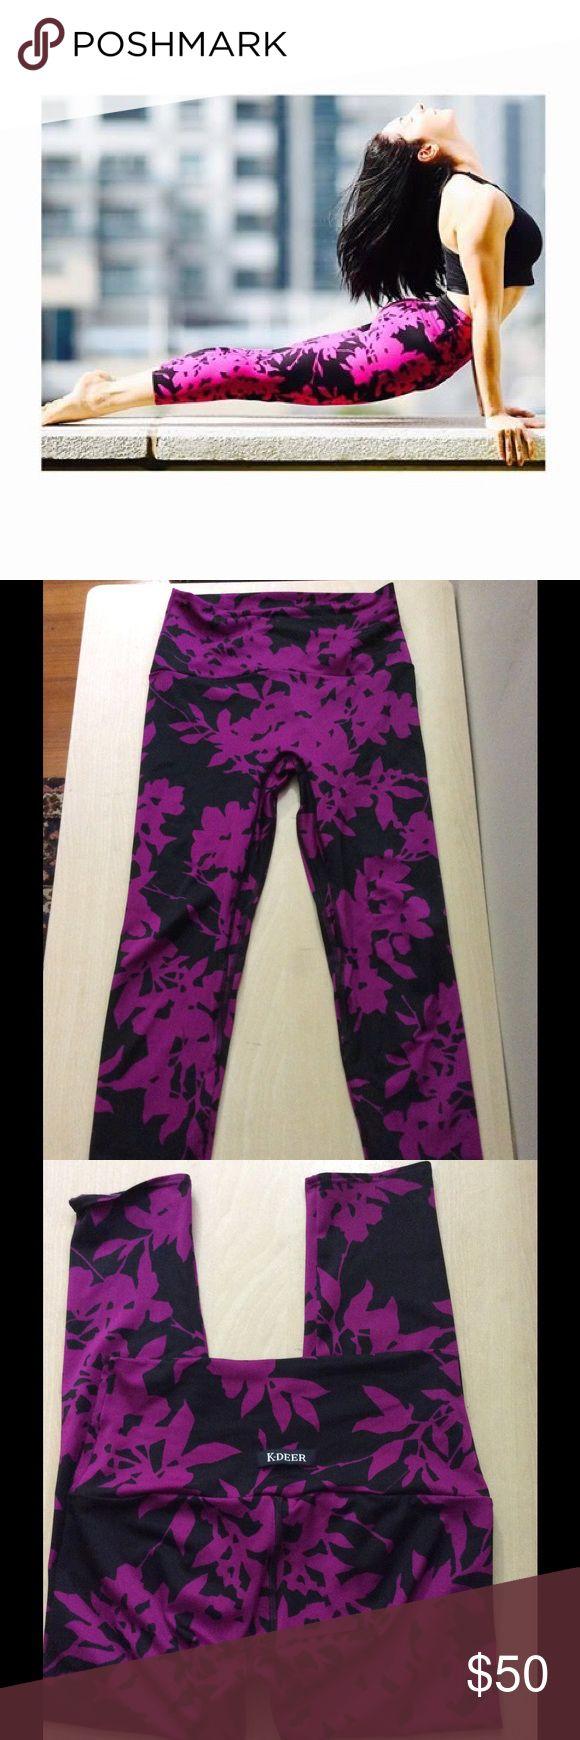 K-DEER Bordeaux Capri Leggings Size S. Capri length. Worn twice. K-DEER Pants Leggings